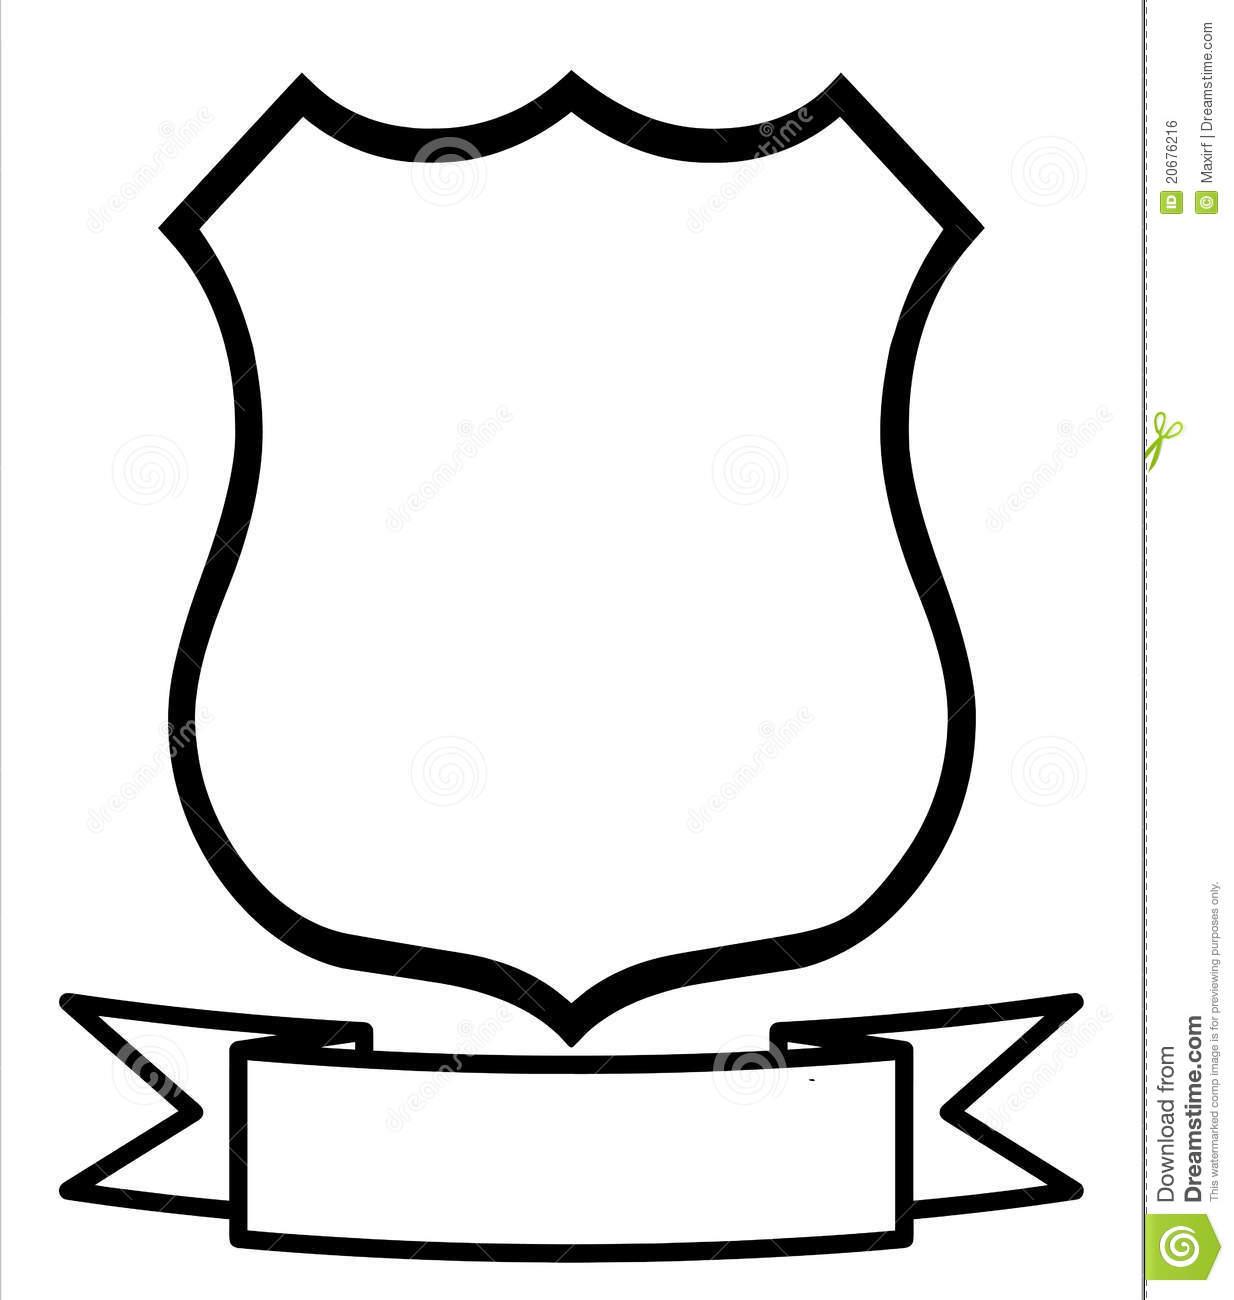 1234x1300 Best Photos Of Blank Badge Template Clip Art Shield Emblem Adult